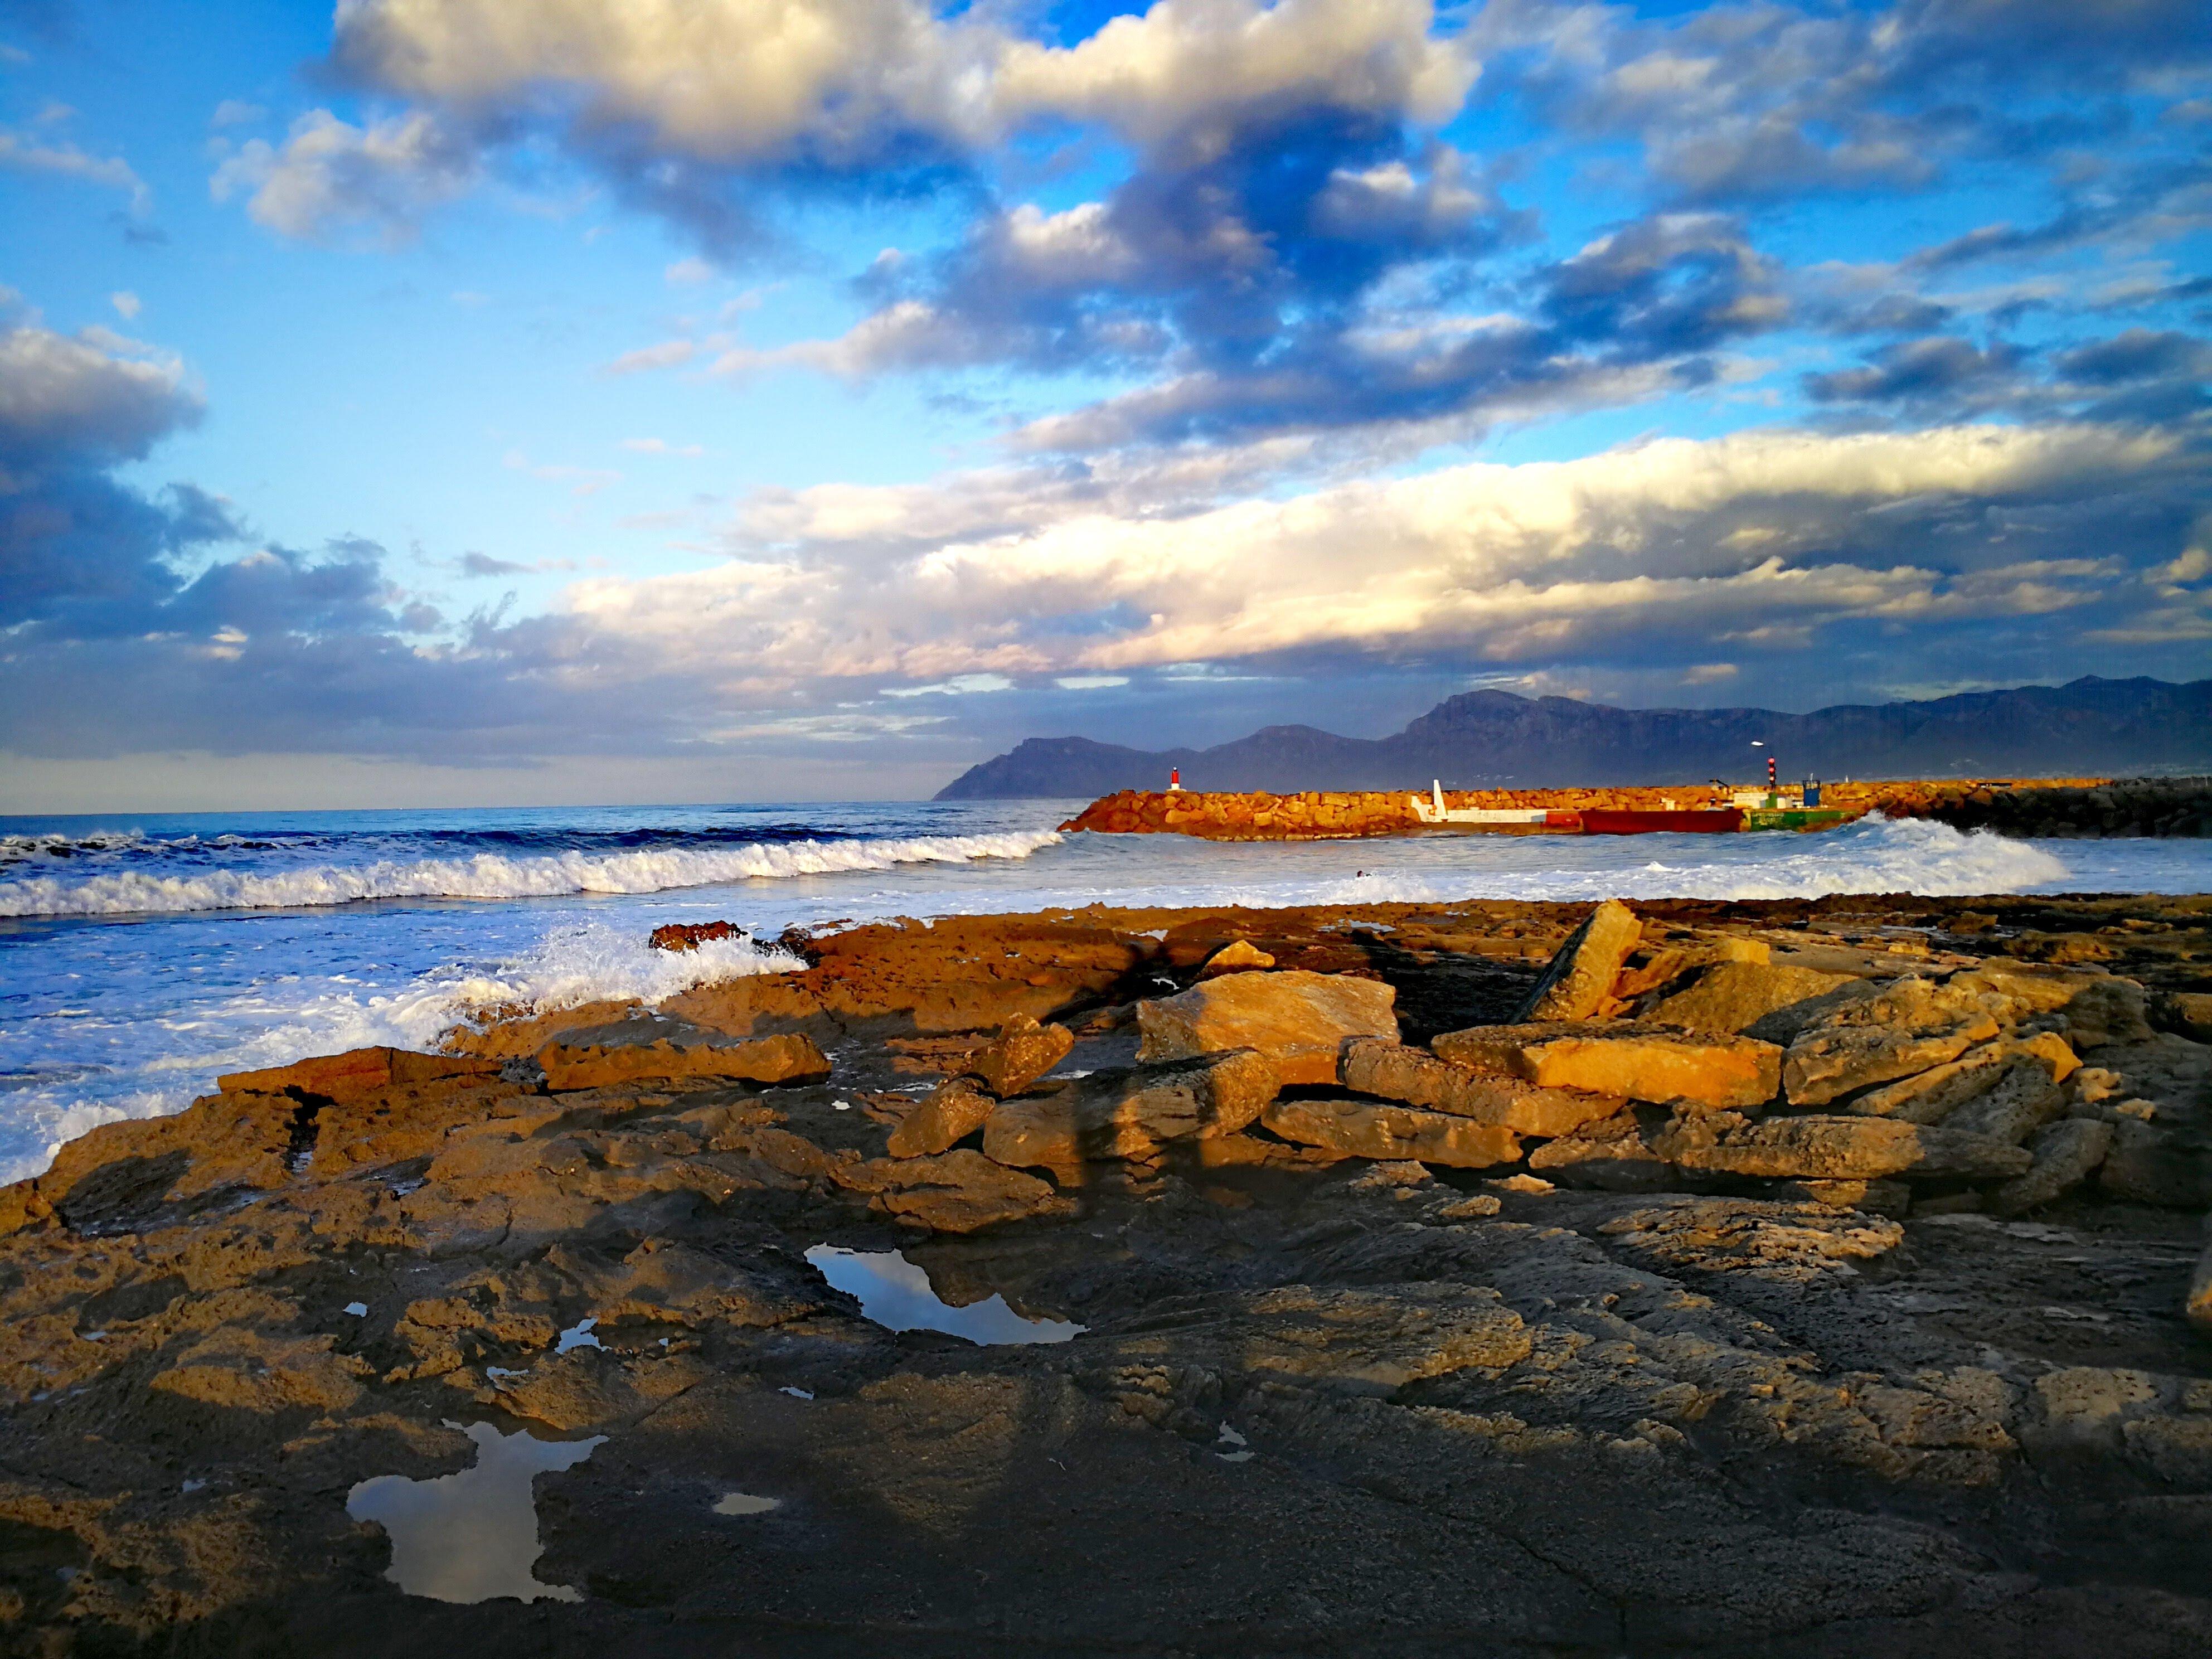 Son Serra de Marina - Coucher de soleil - Majorque - En moins de deux